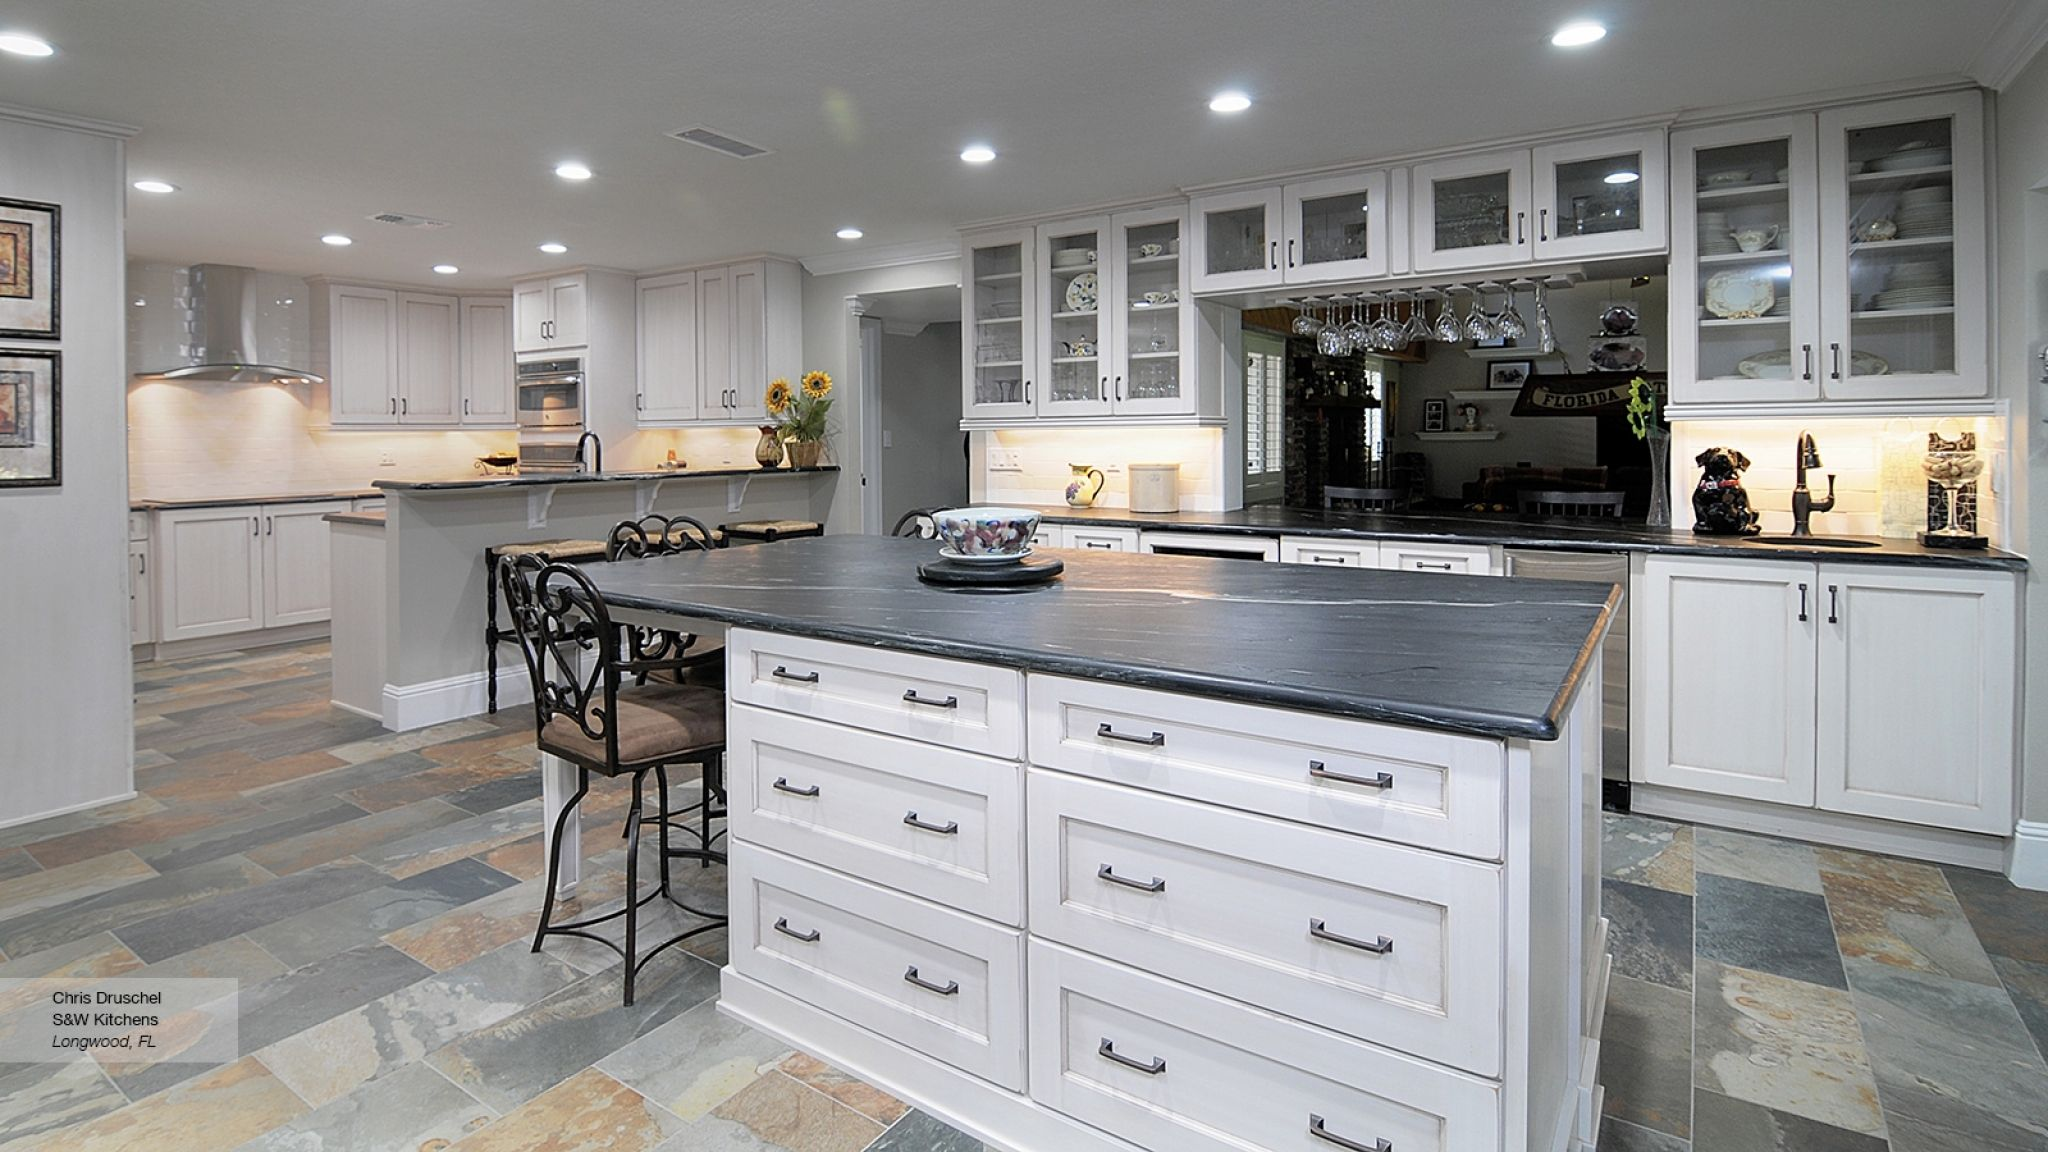 shaker style kitchen cabinets white - kitchen nook lighting ideas ...